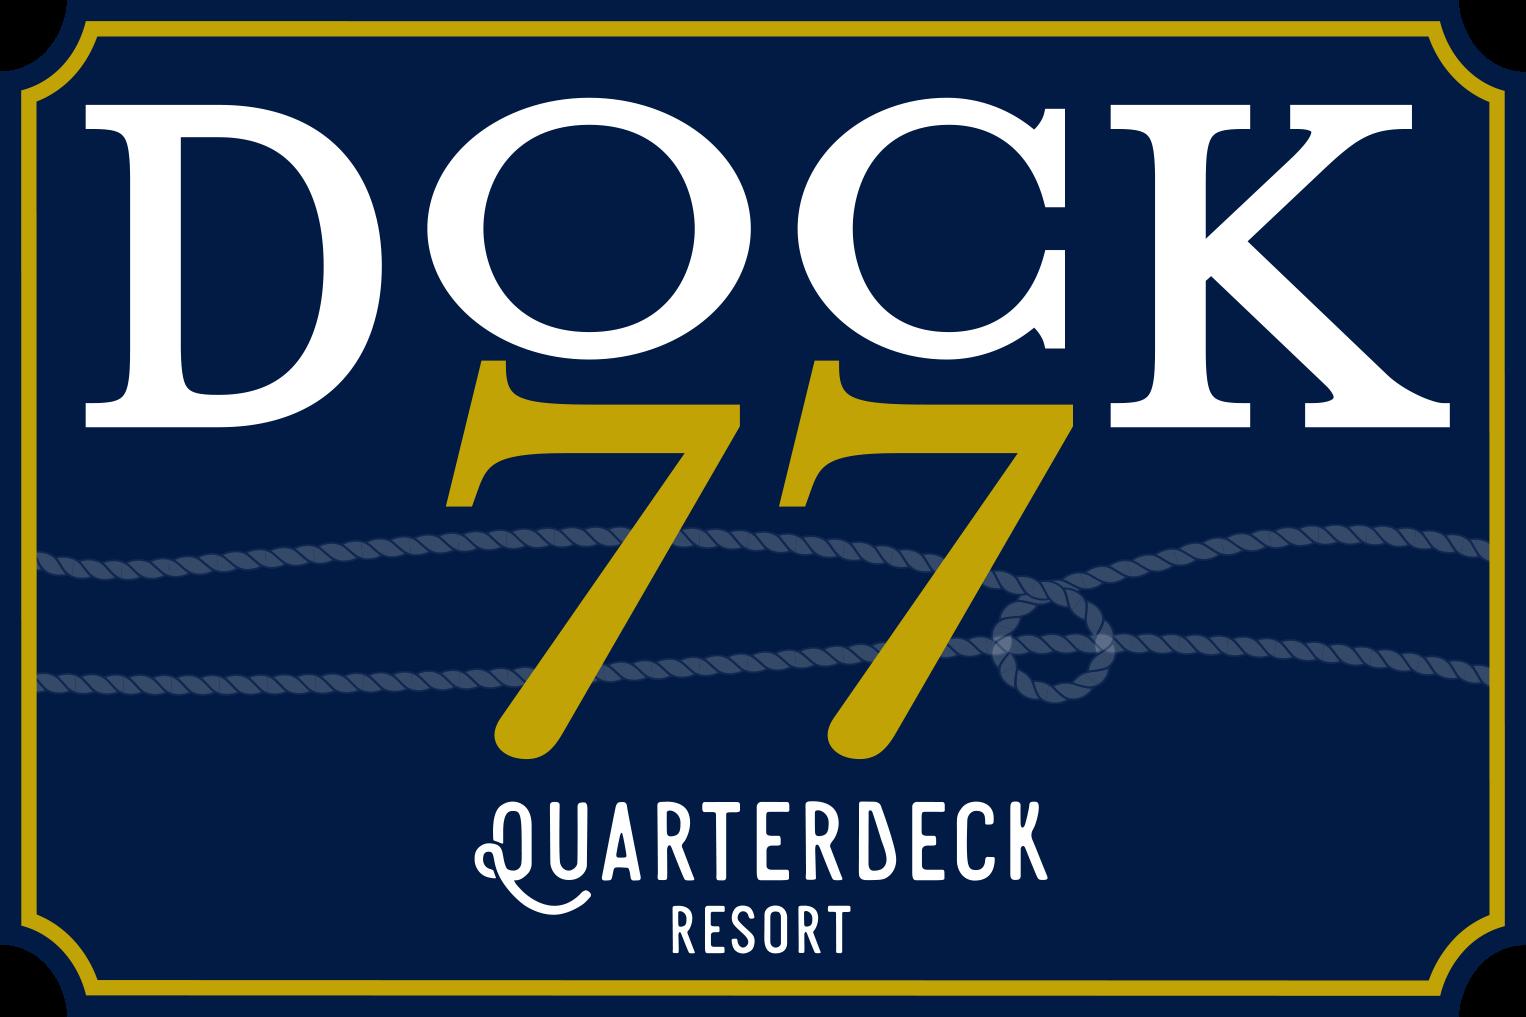 dock 77 logo